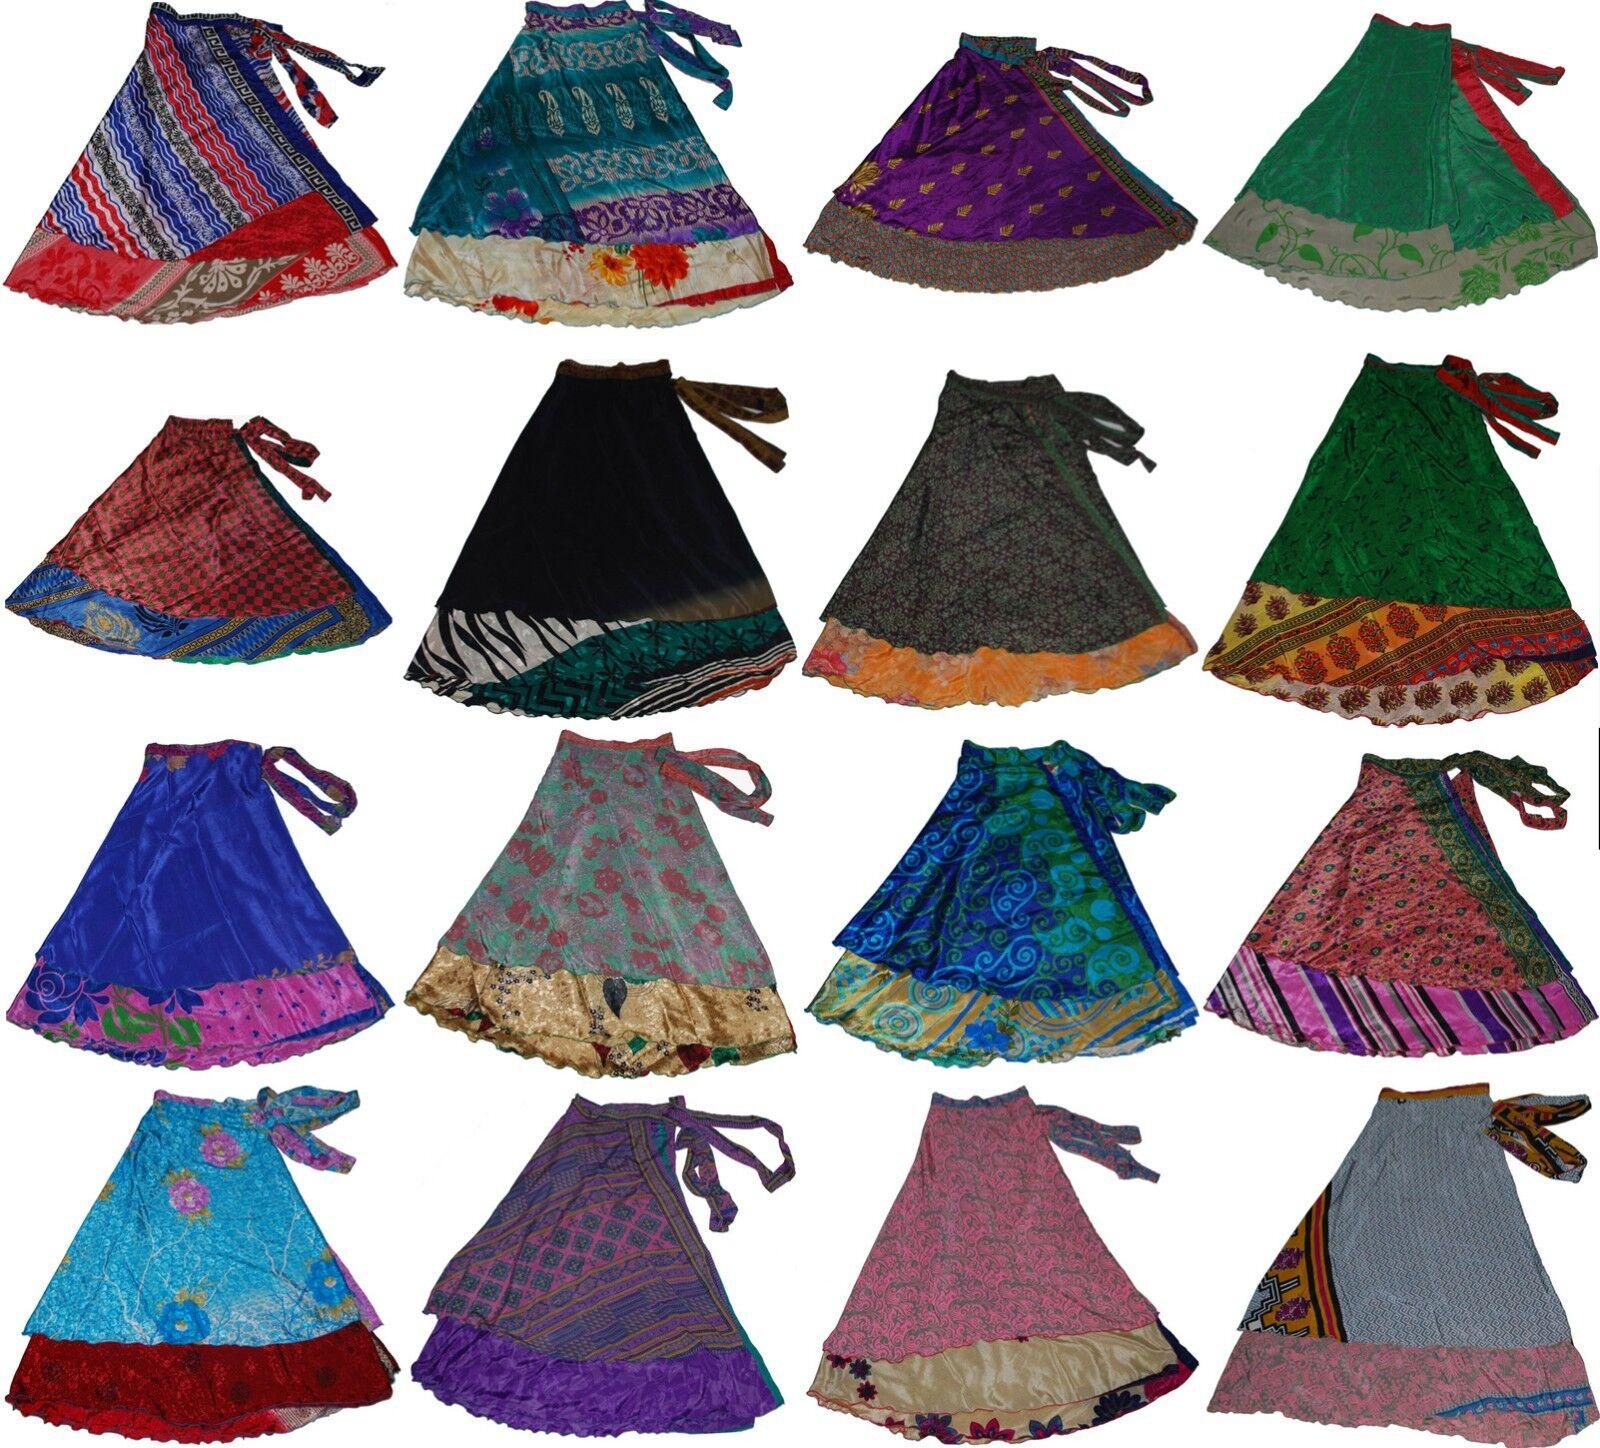 Wholesale Women Wrap Around Sari Magic Skirt 50 Pcs 36 inch Long